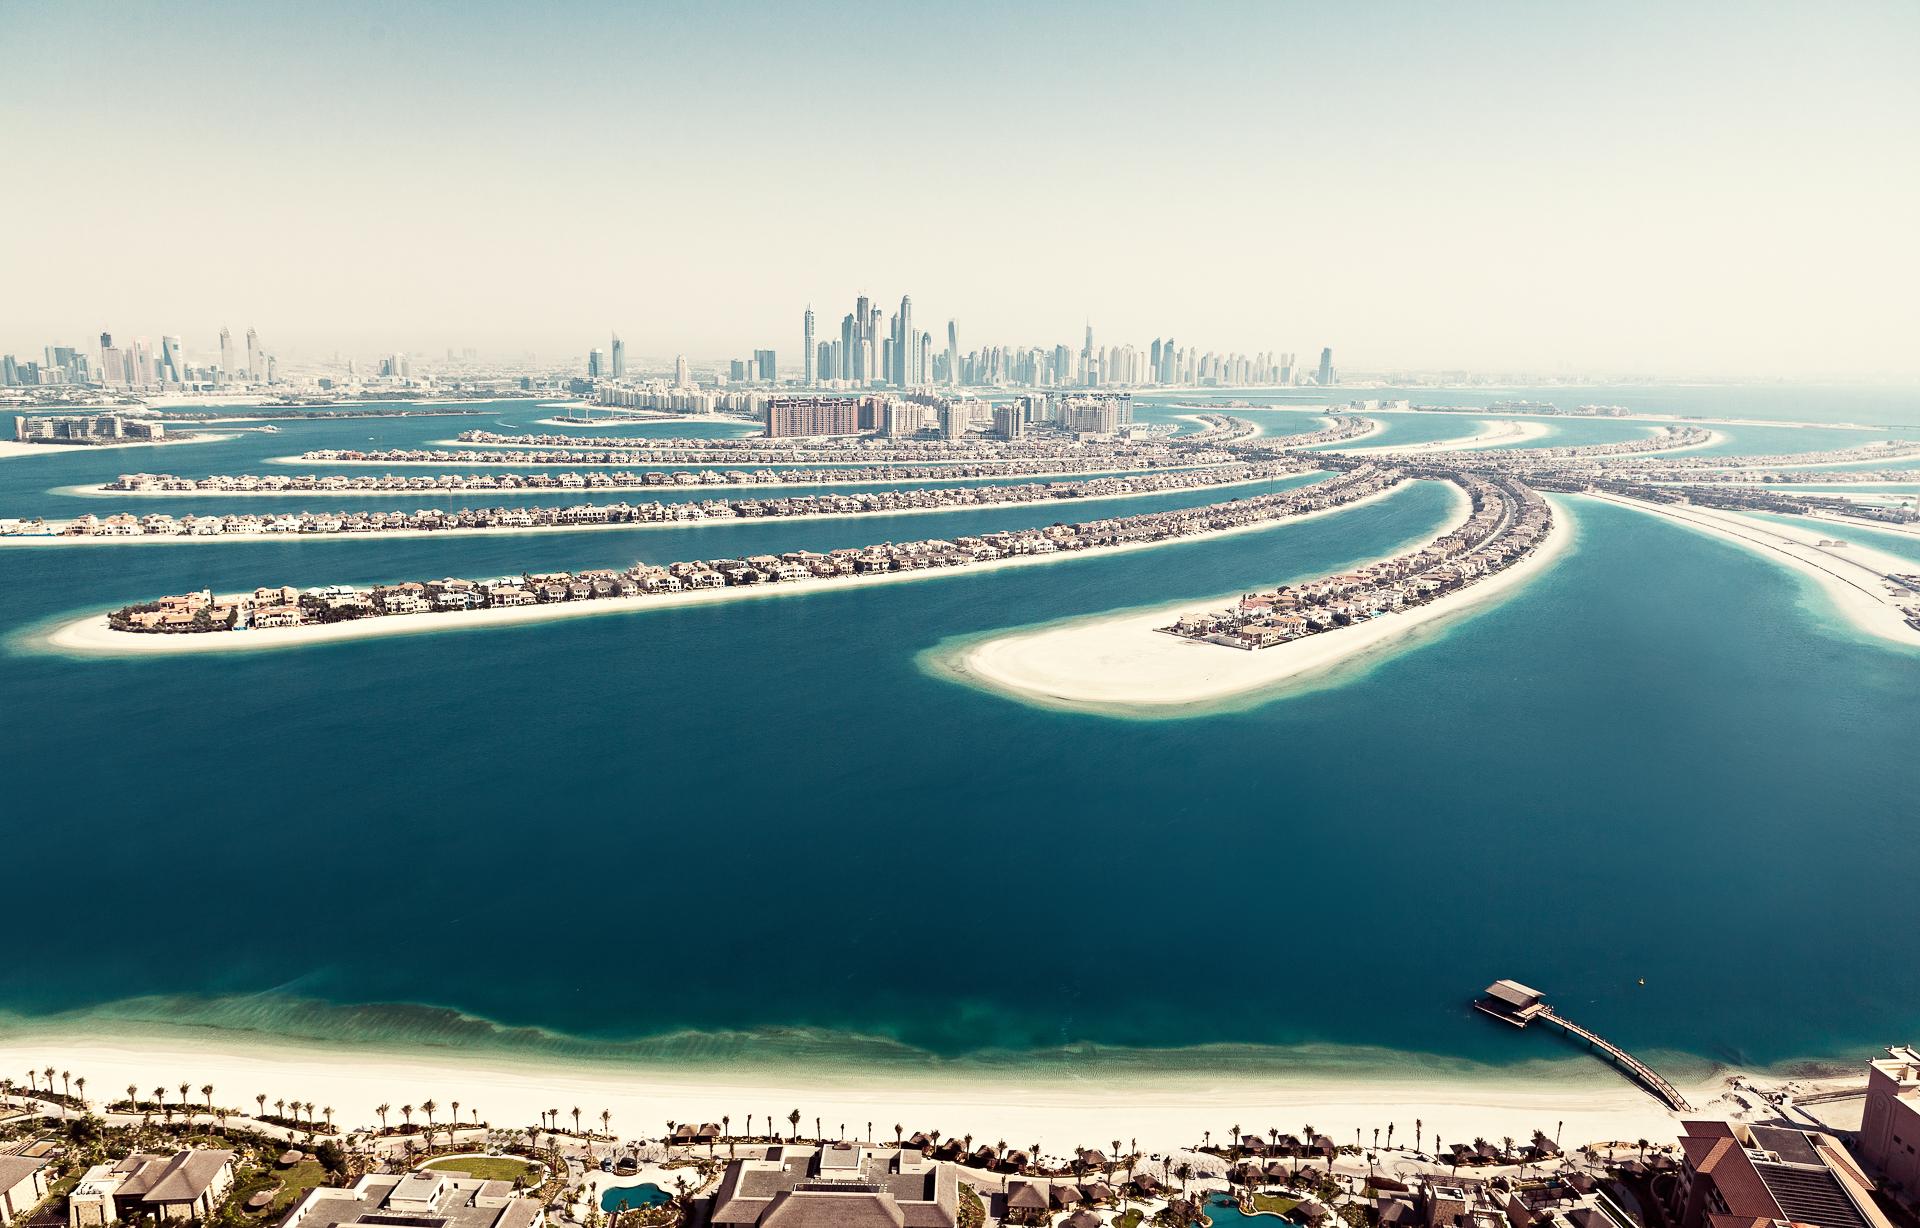 Gökhan_Orhan_Portfolio_Landscape_Dubai-4